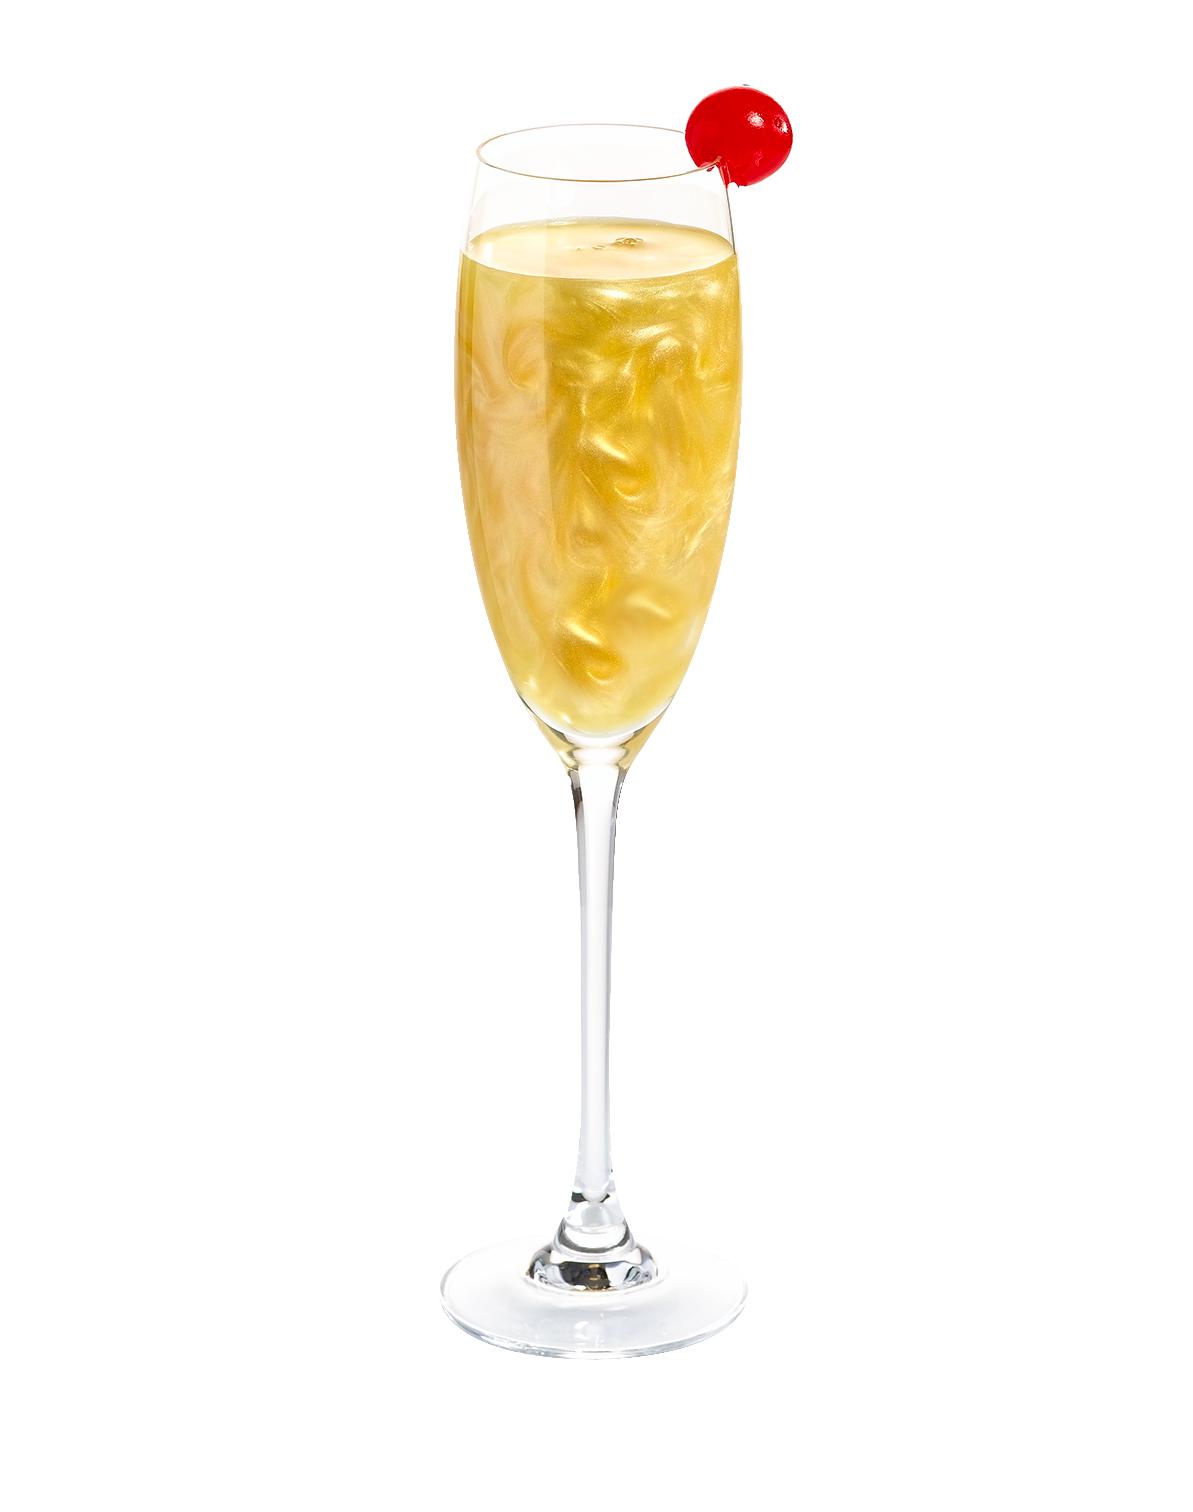 https://www.mirelys.eu/wp-content/uploads/2018/03/cocktail-tropical-hd-06.jpg